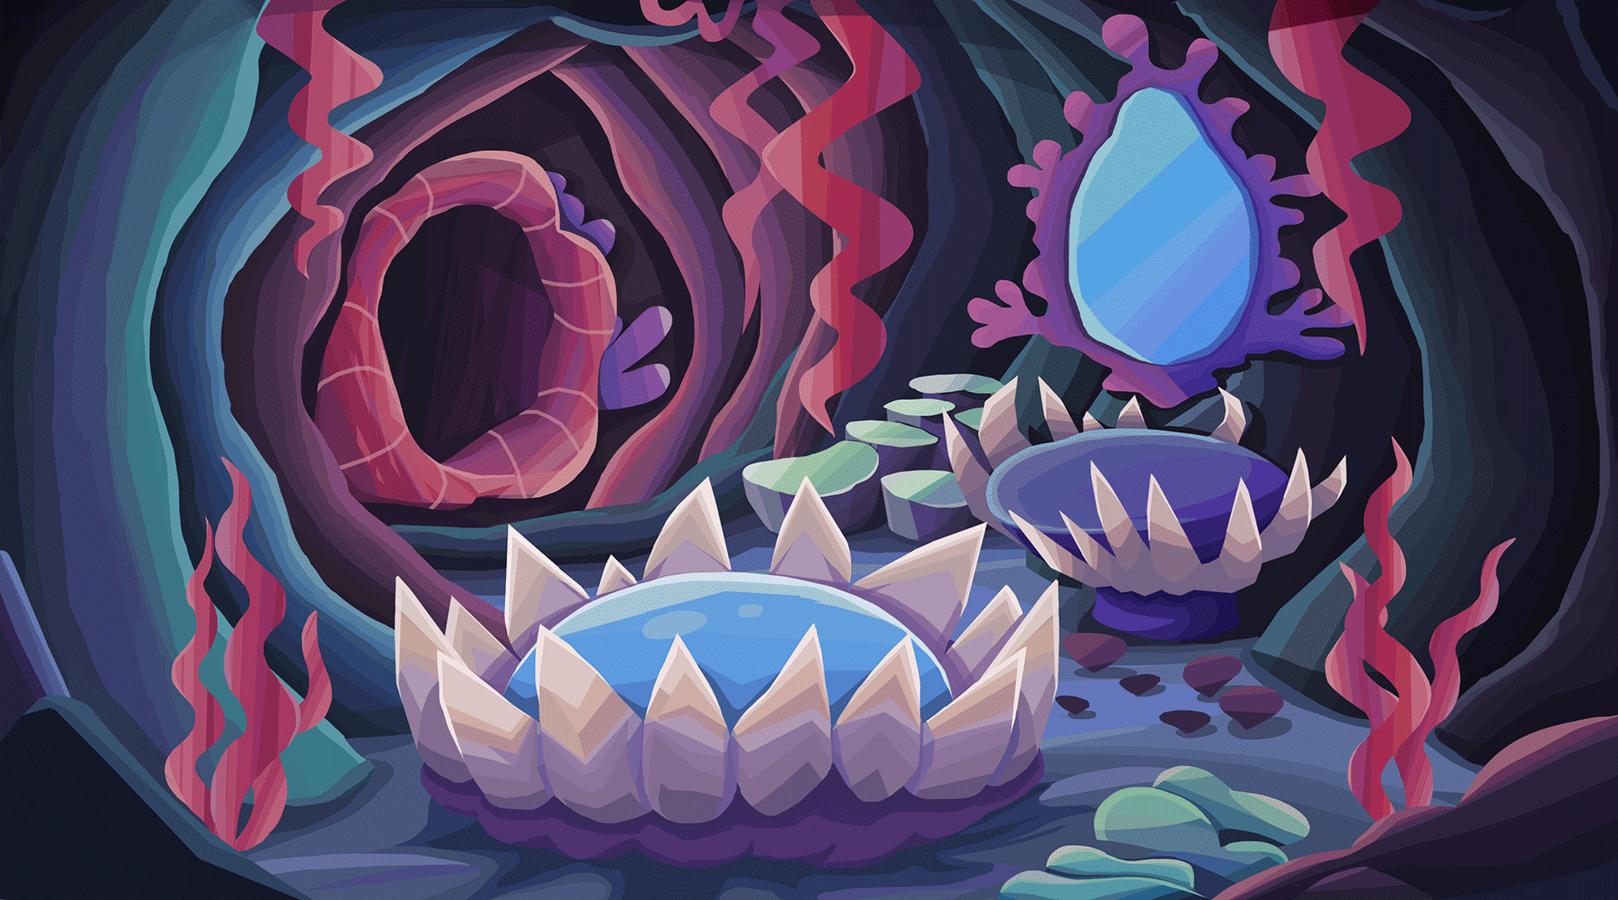 ursula cave